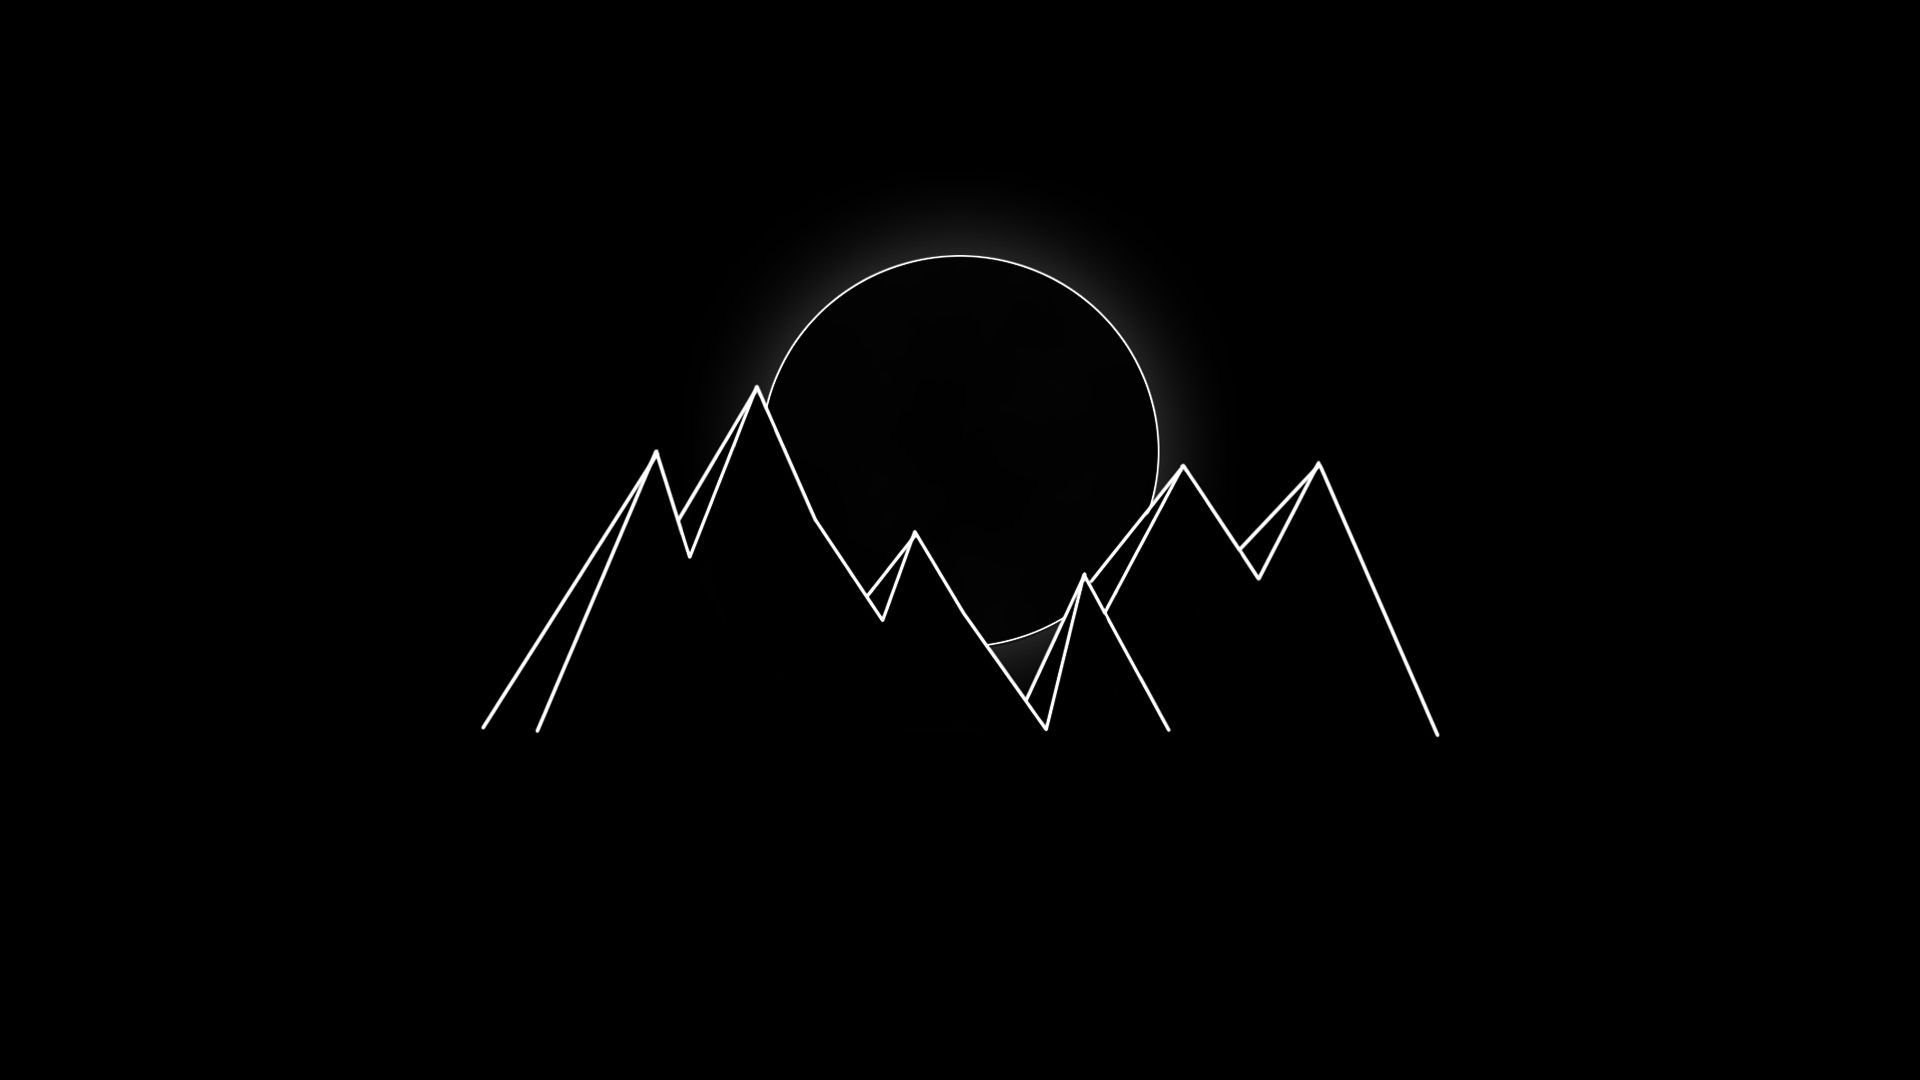 Download 1920x1080 Wallpaper Minimal Dark Mountains Full Hd